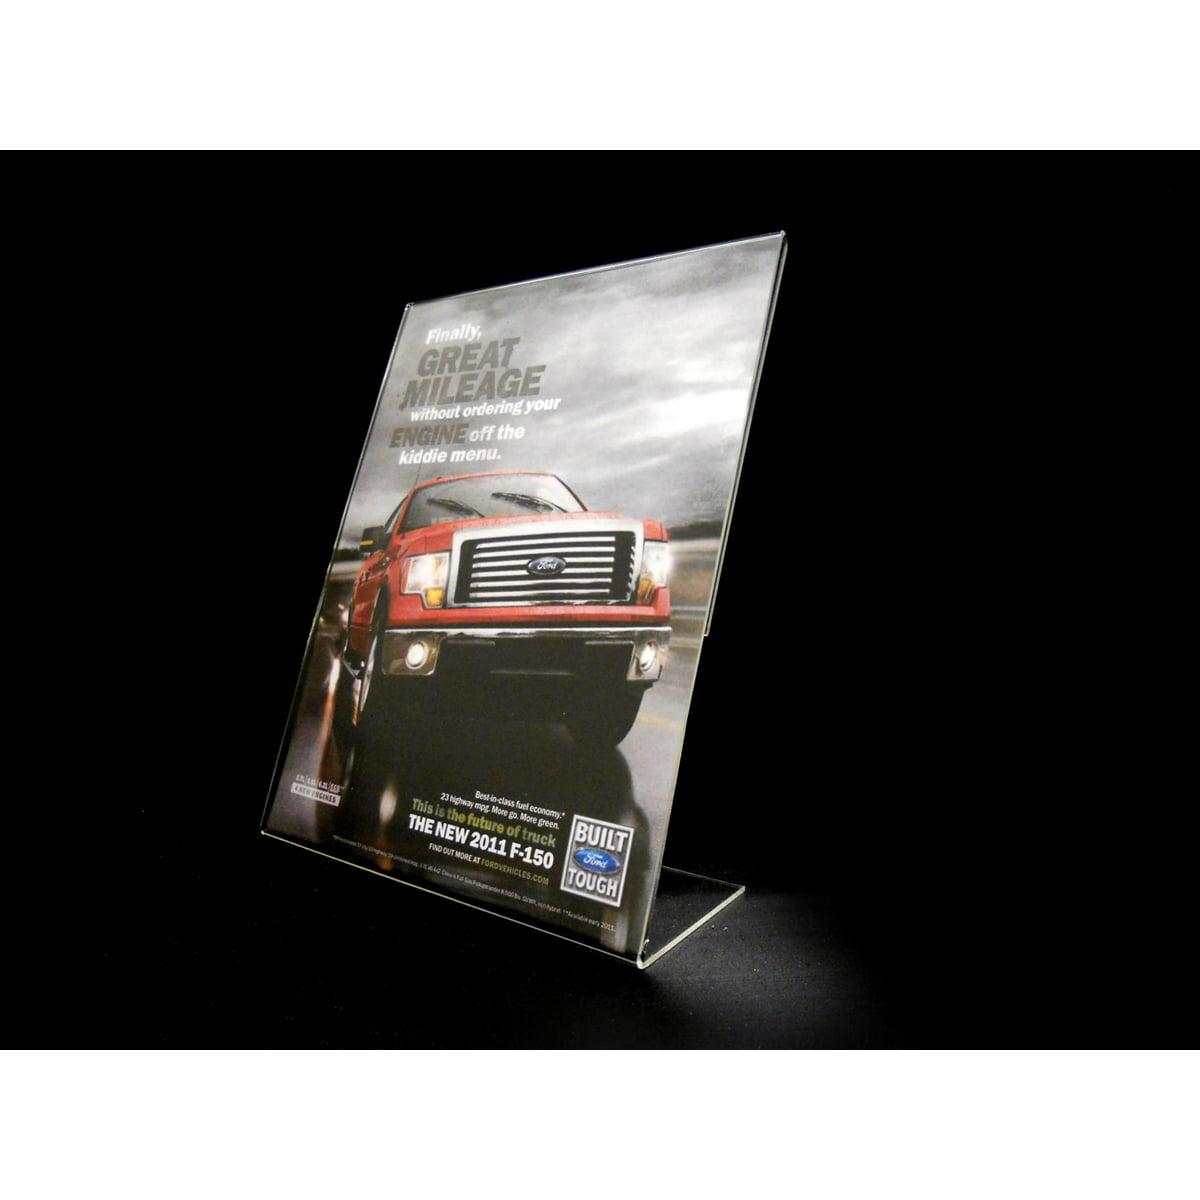 "Acrylic Slant Back Display Sign Holder 8.5"" x 11"" by Signworld America"